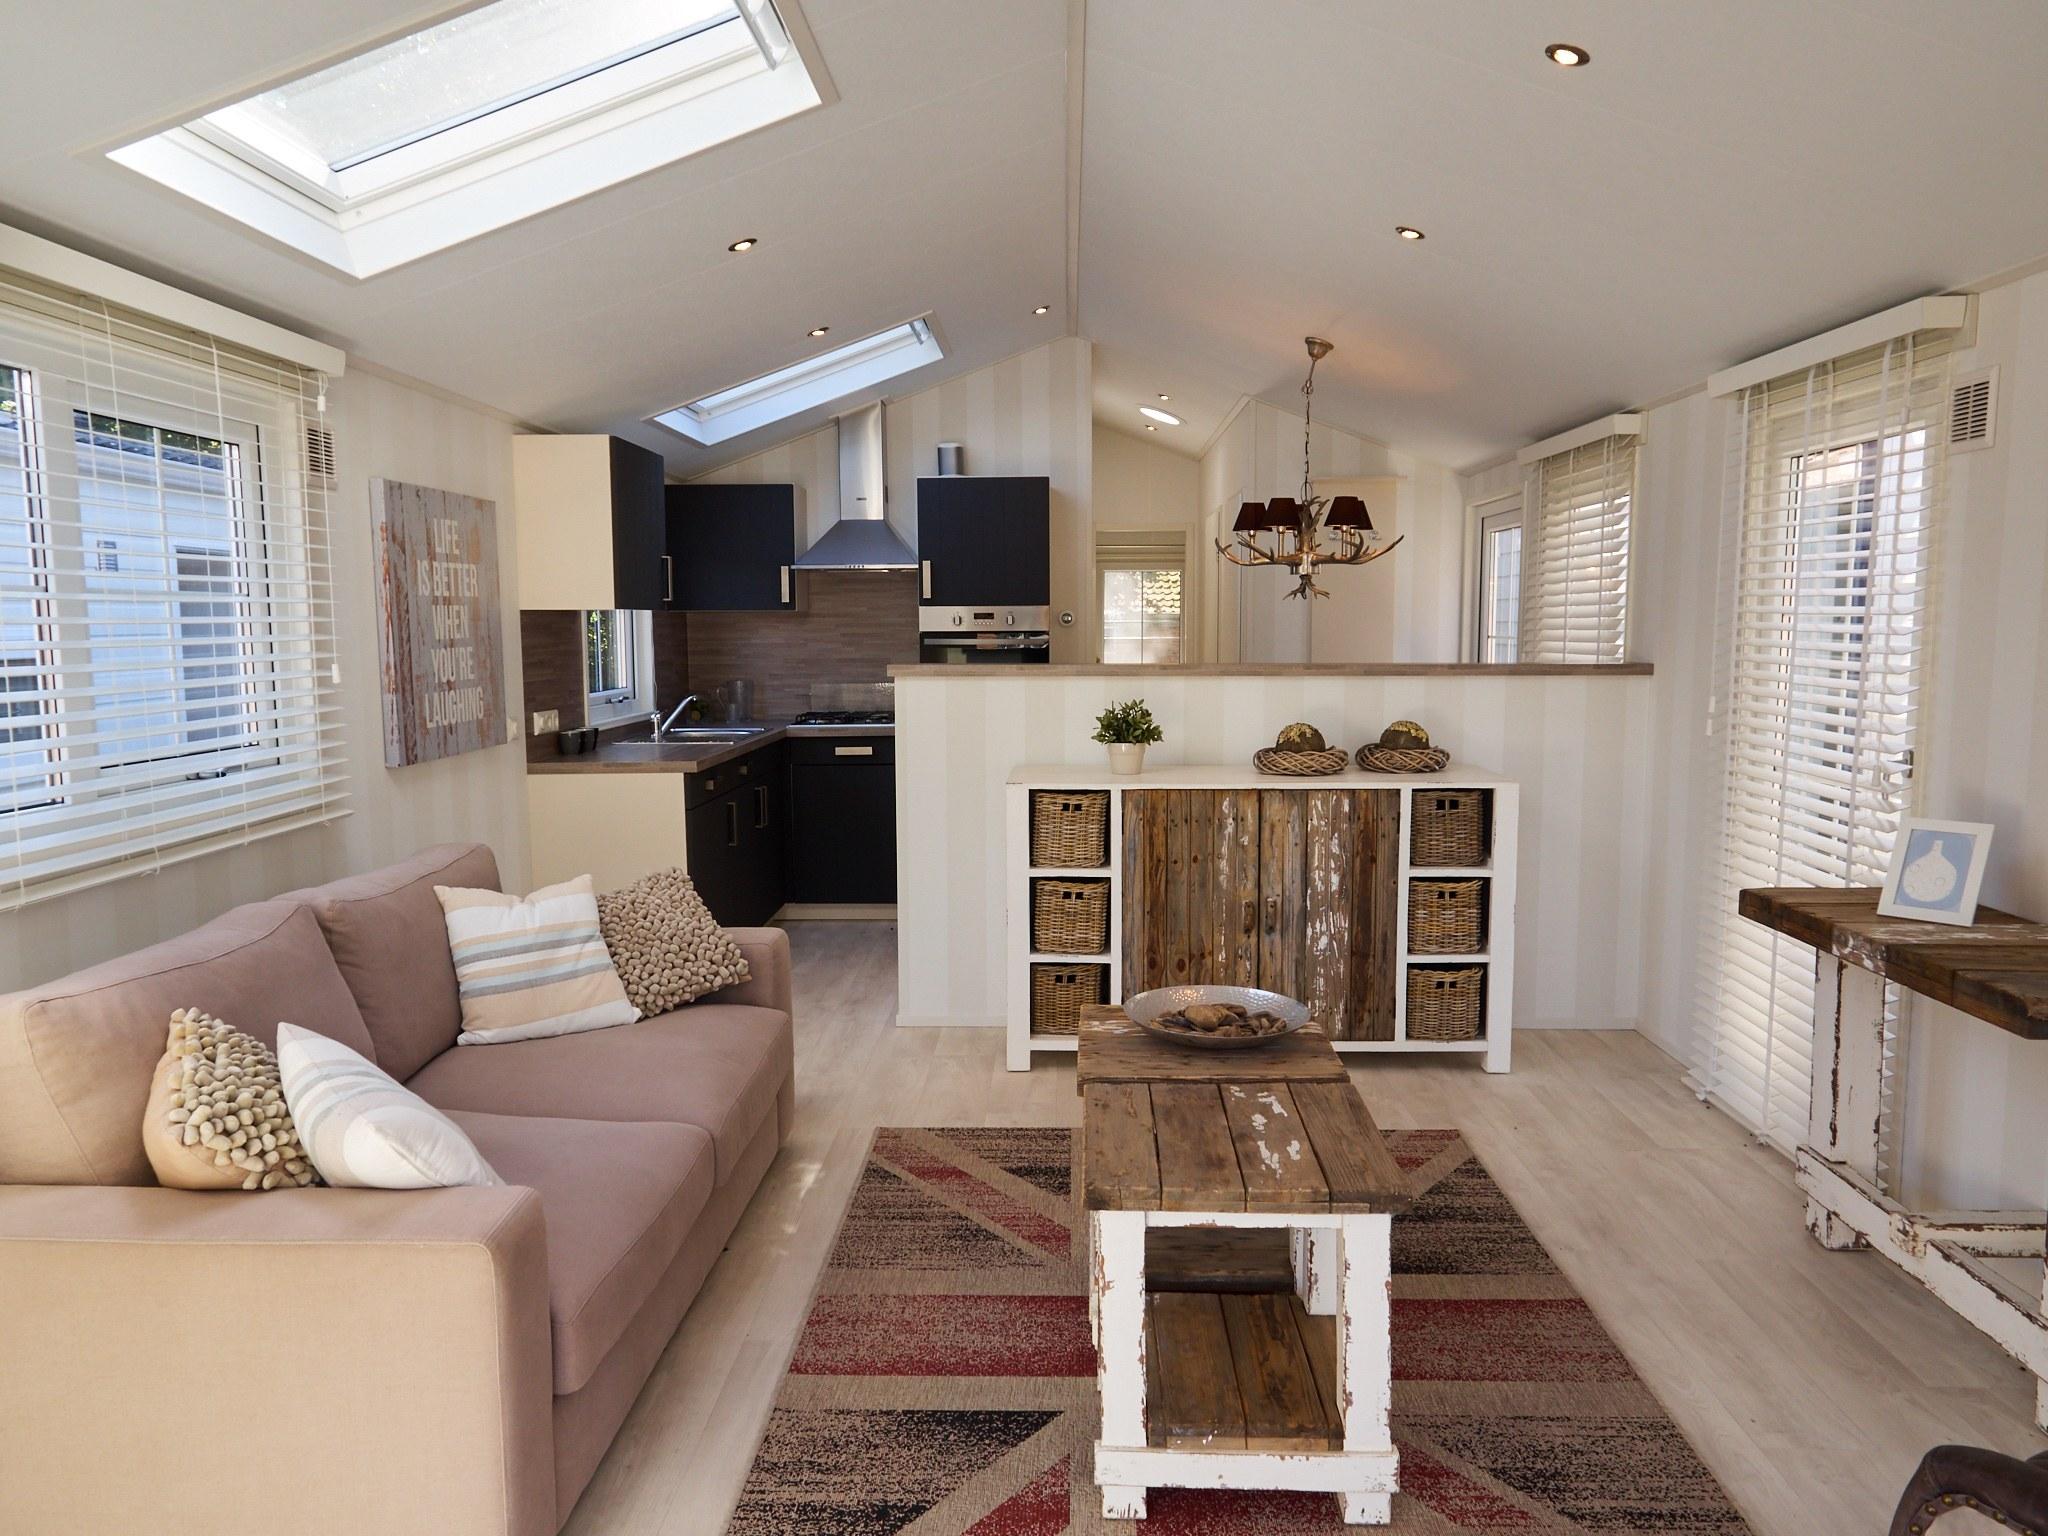 holland living in a box. Black Bedroom Furniture Sets. Home Design Ideas